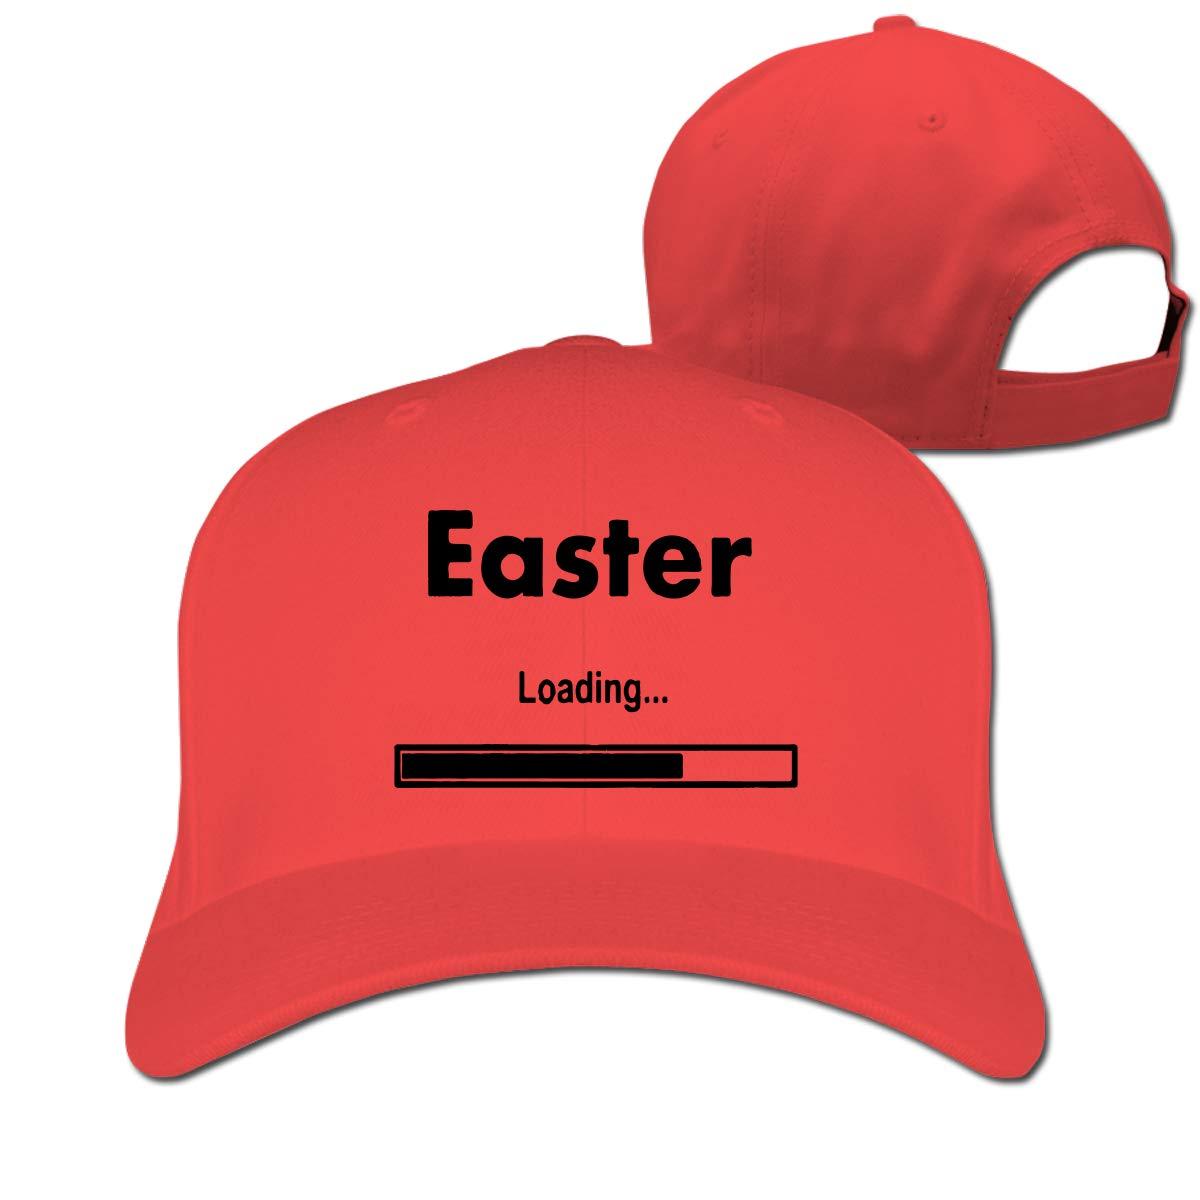 Easter Loading-1 Unisex Pure Color Baseball Cap Classic Adjustable Plain Hat